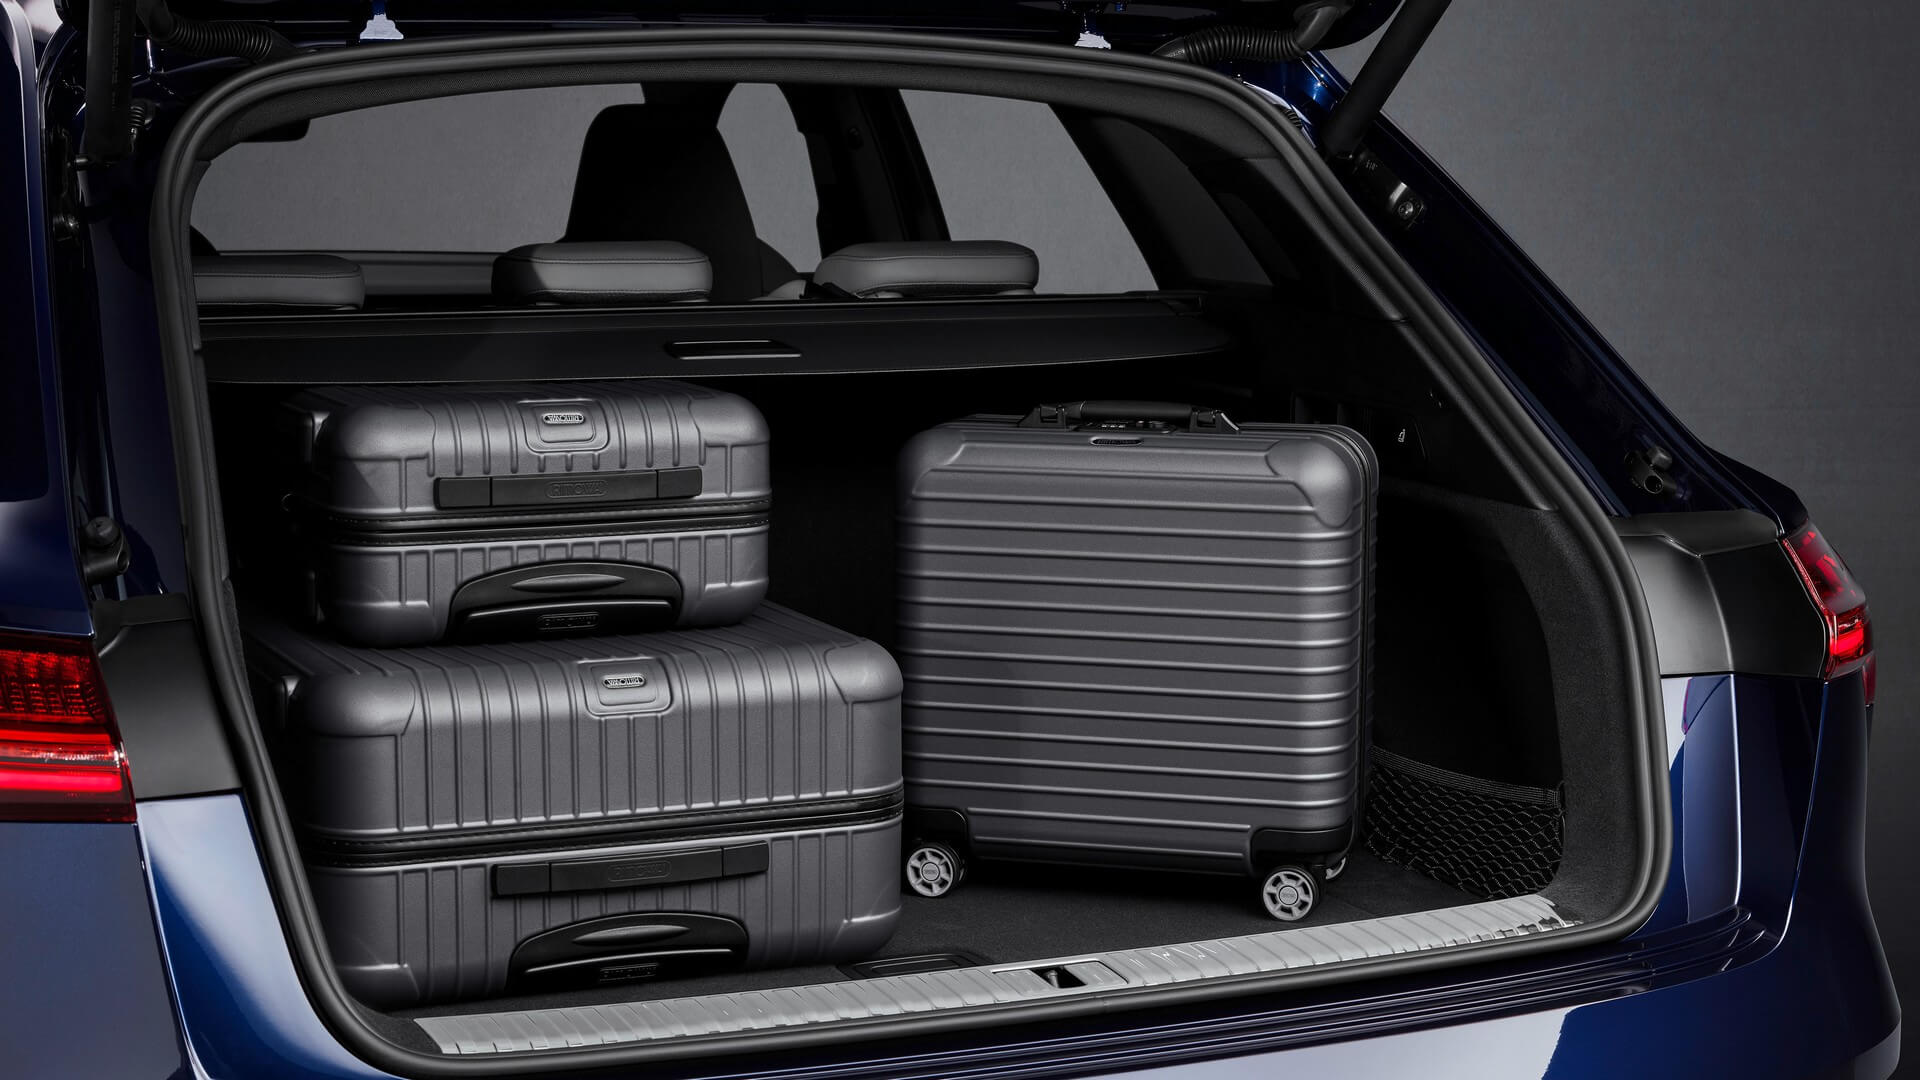 Audi-E-Tron-S-and-E-Tron-S-Sportback-2020-104